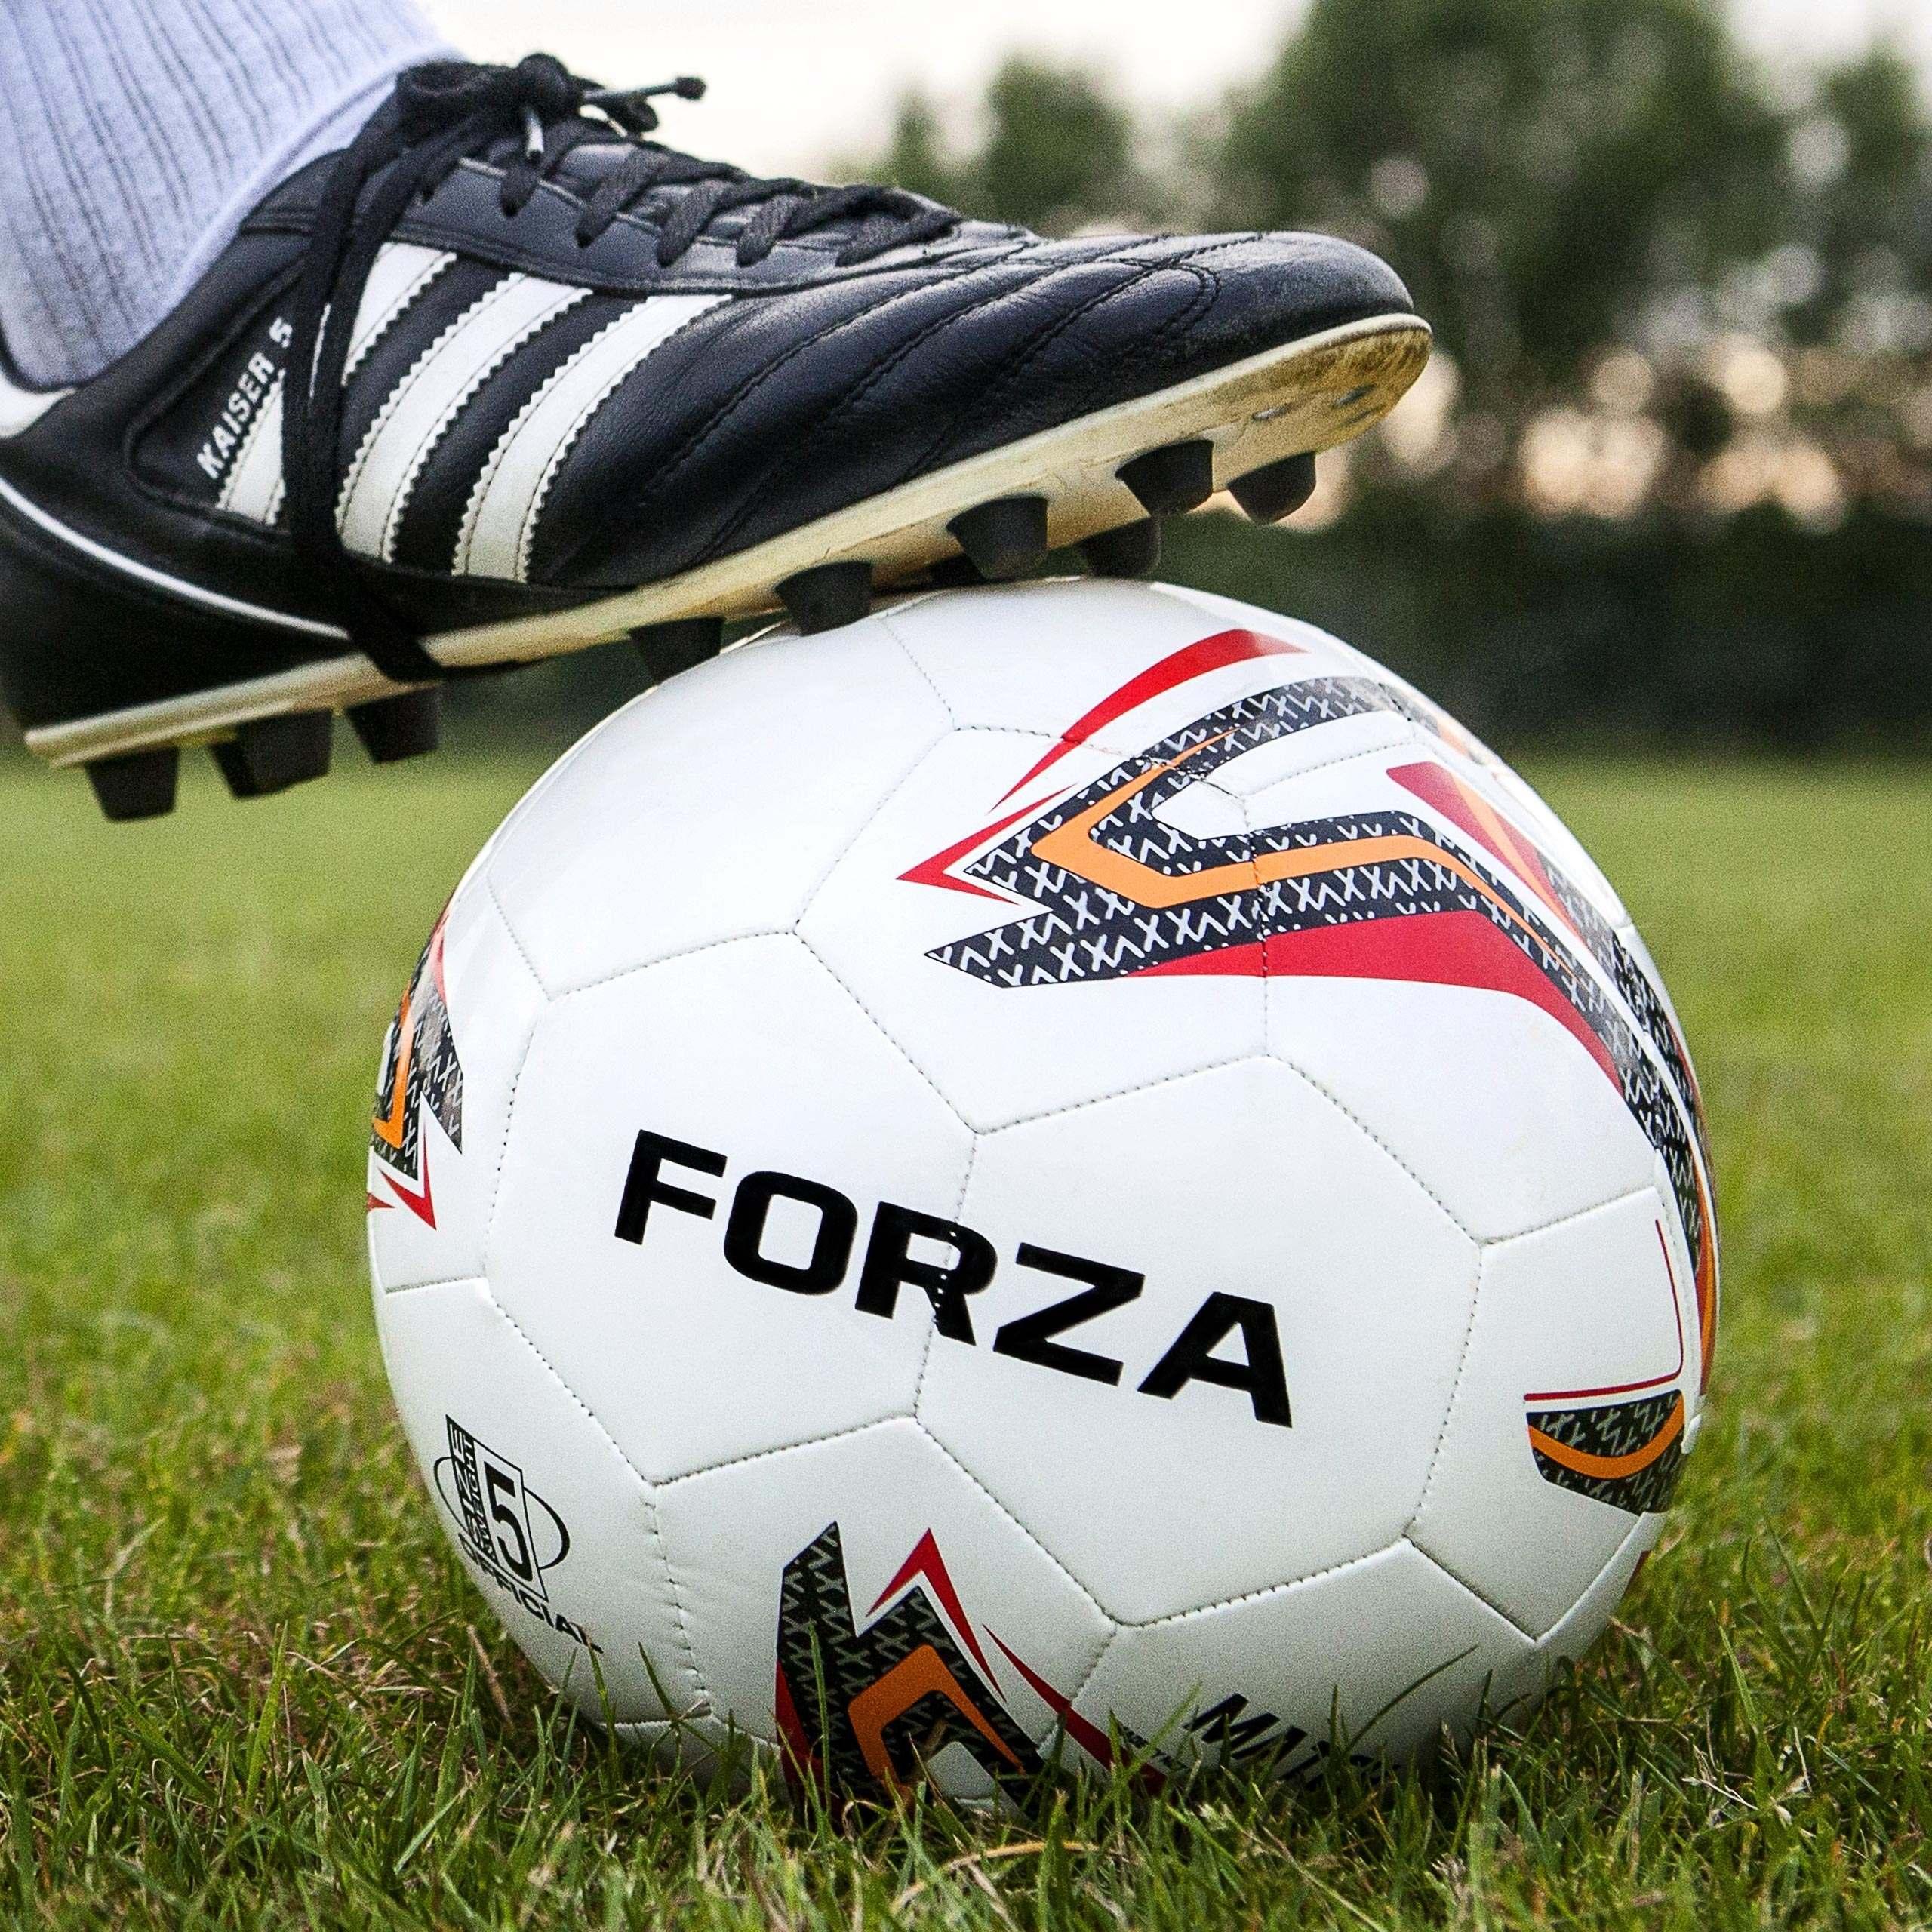 Forza Match P10 Fusion Soccer Ball